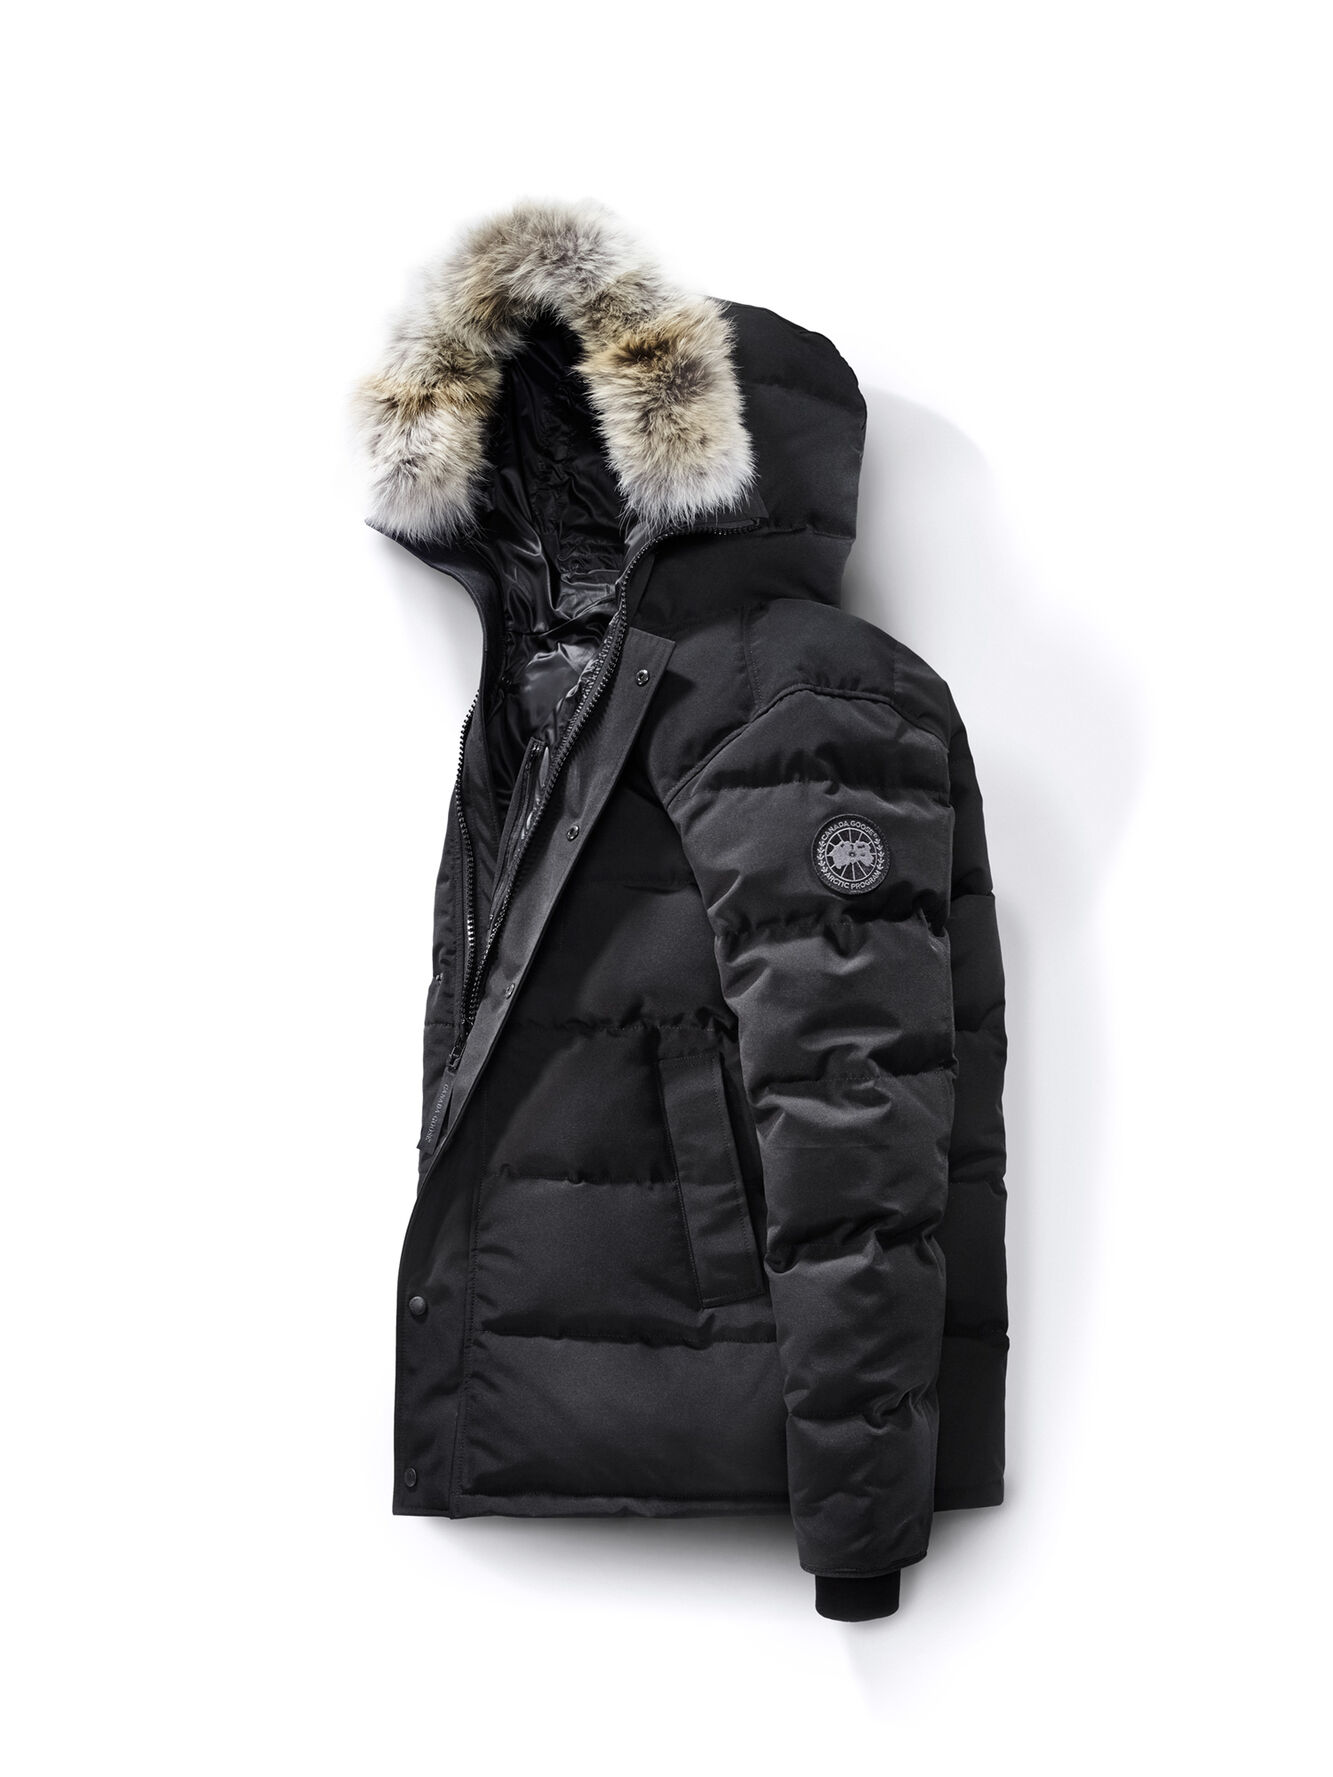 Canada Goose' Men's Northern Utility Gloves M - Black